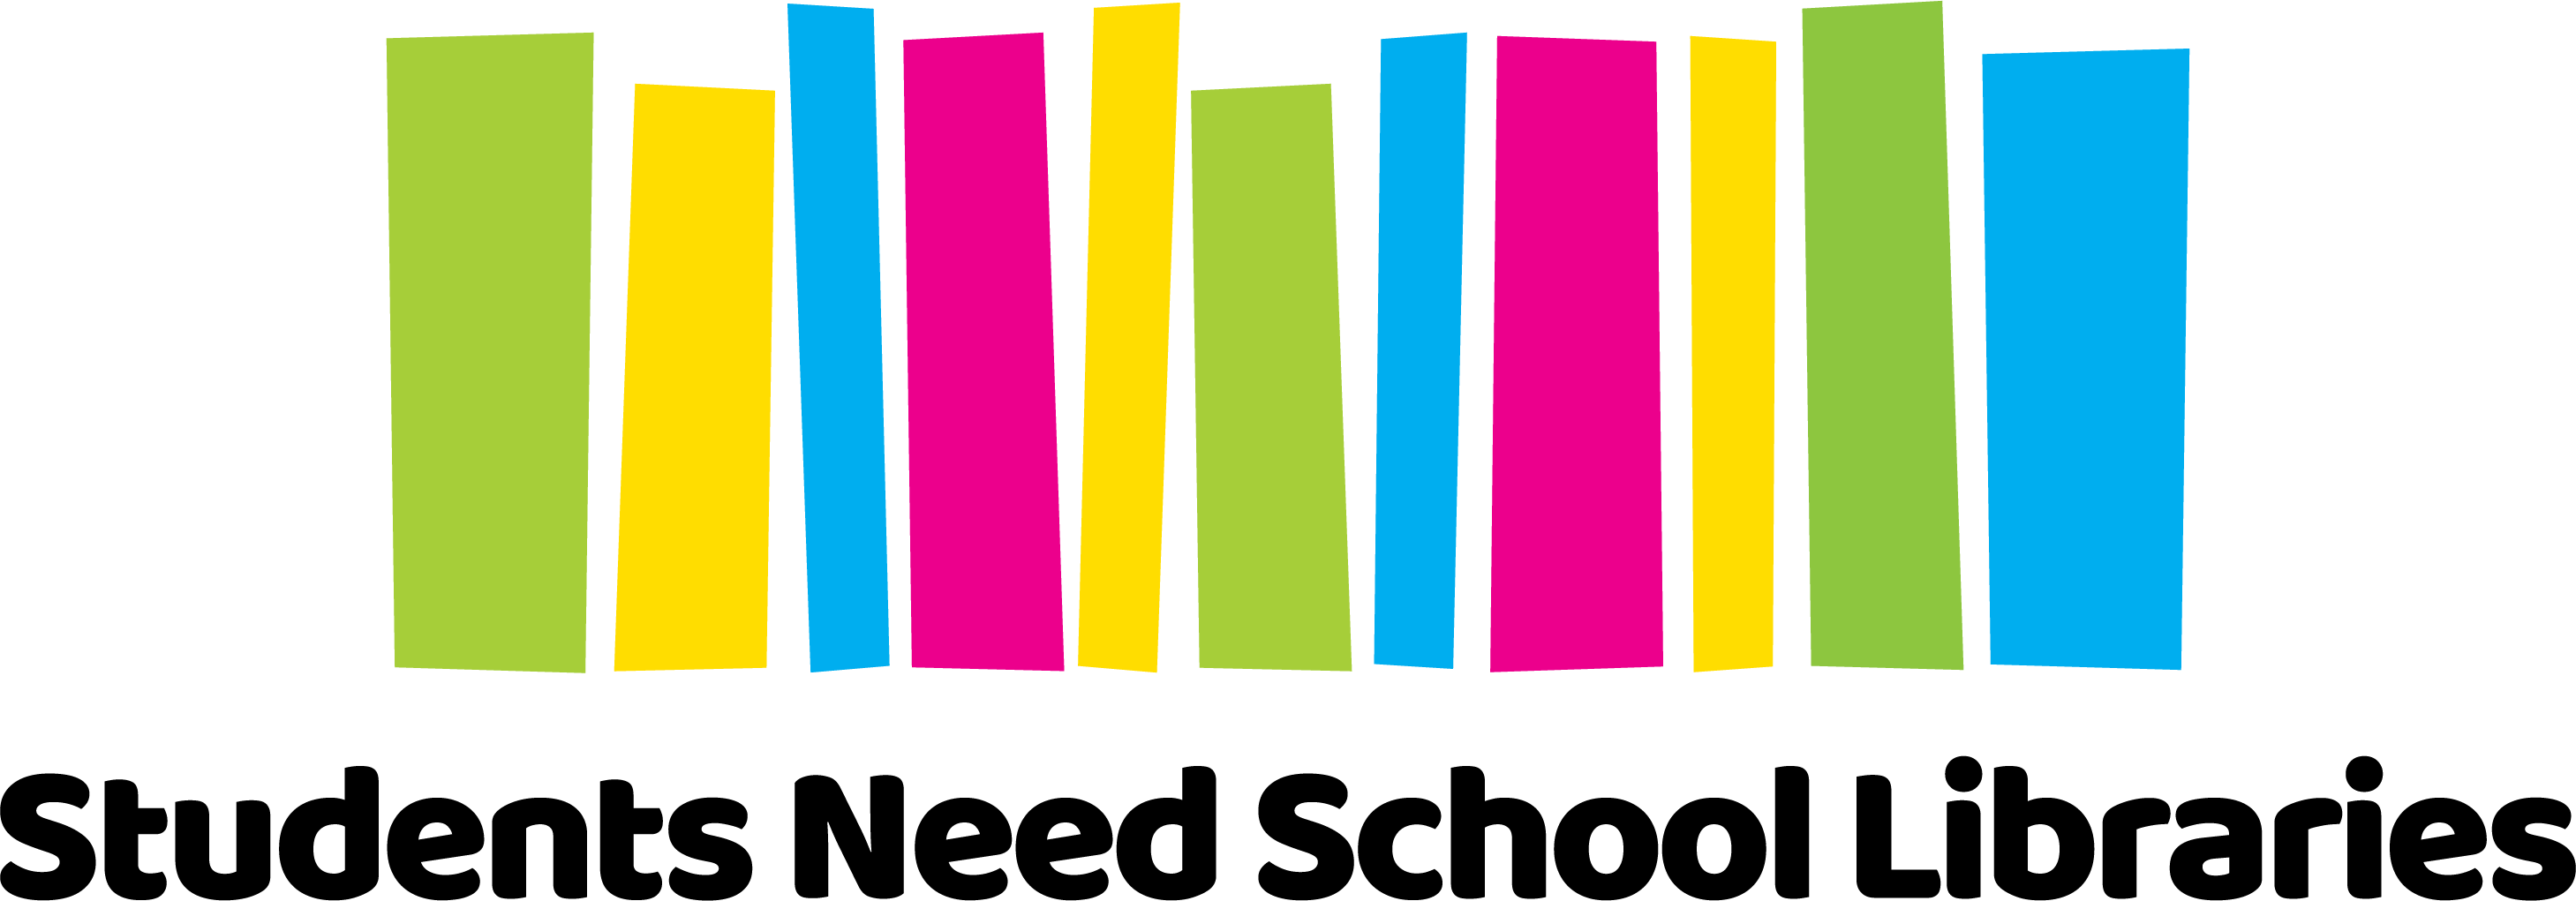 Students Need School Libraries Logo